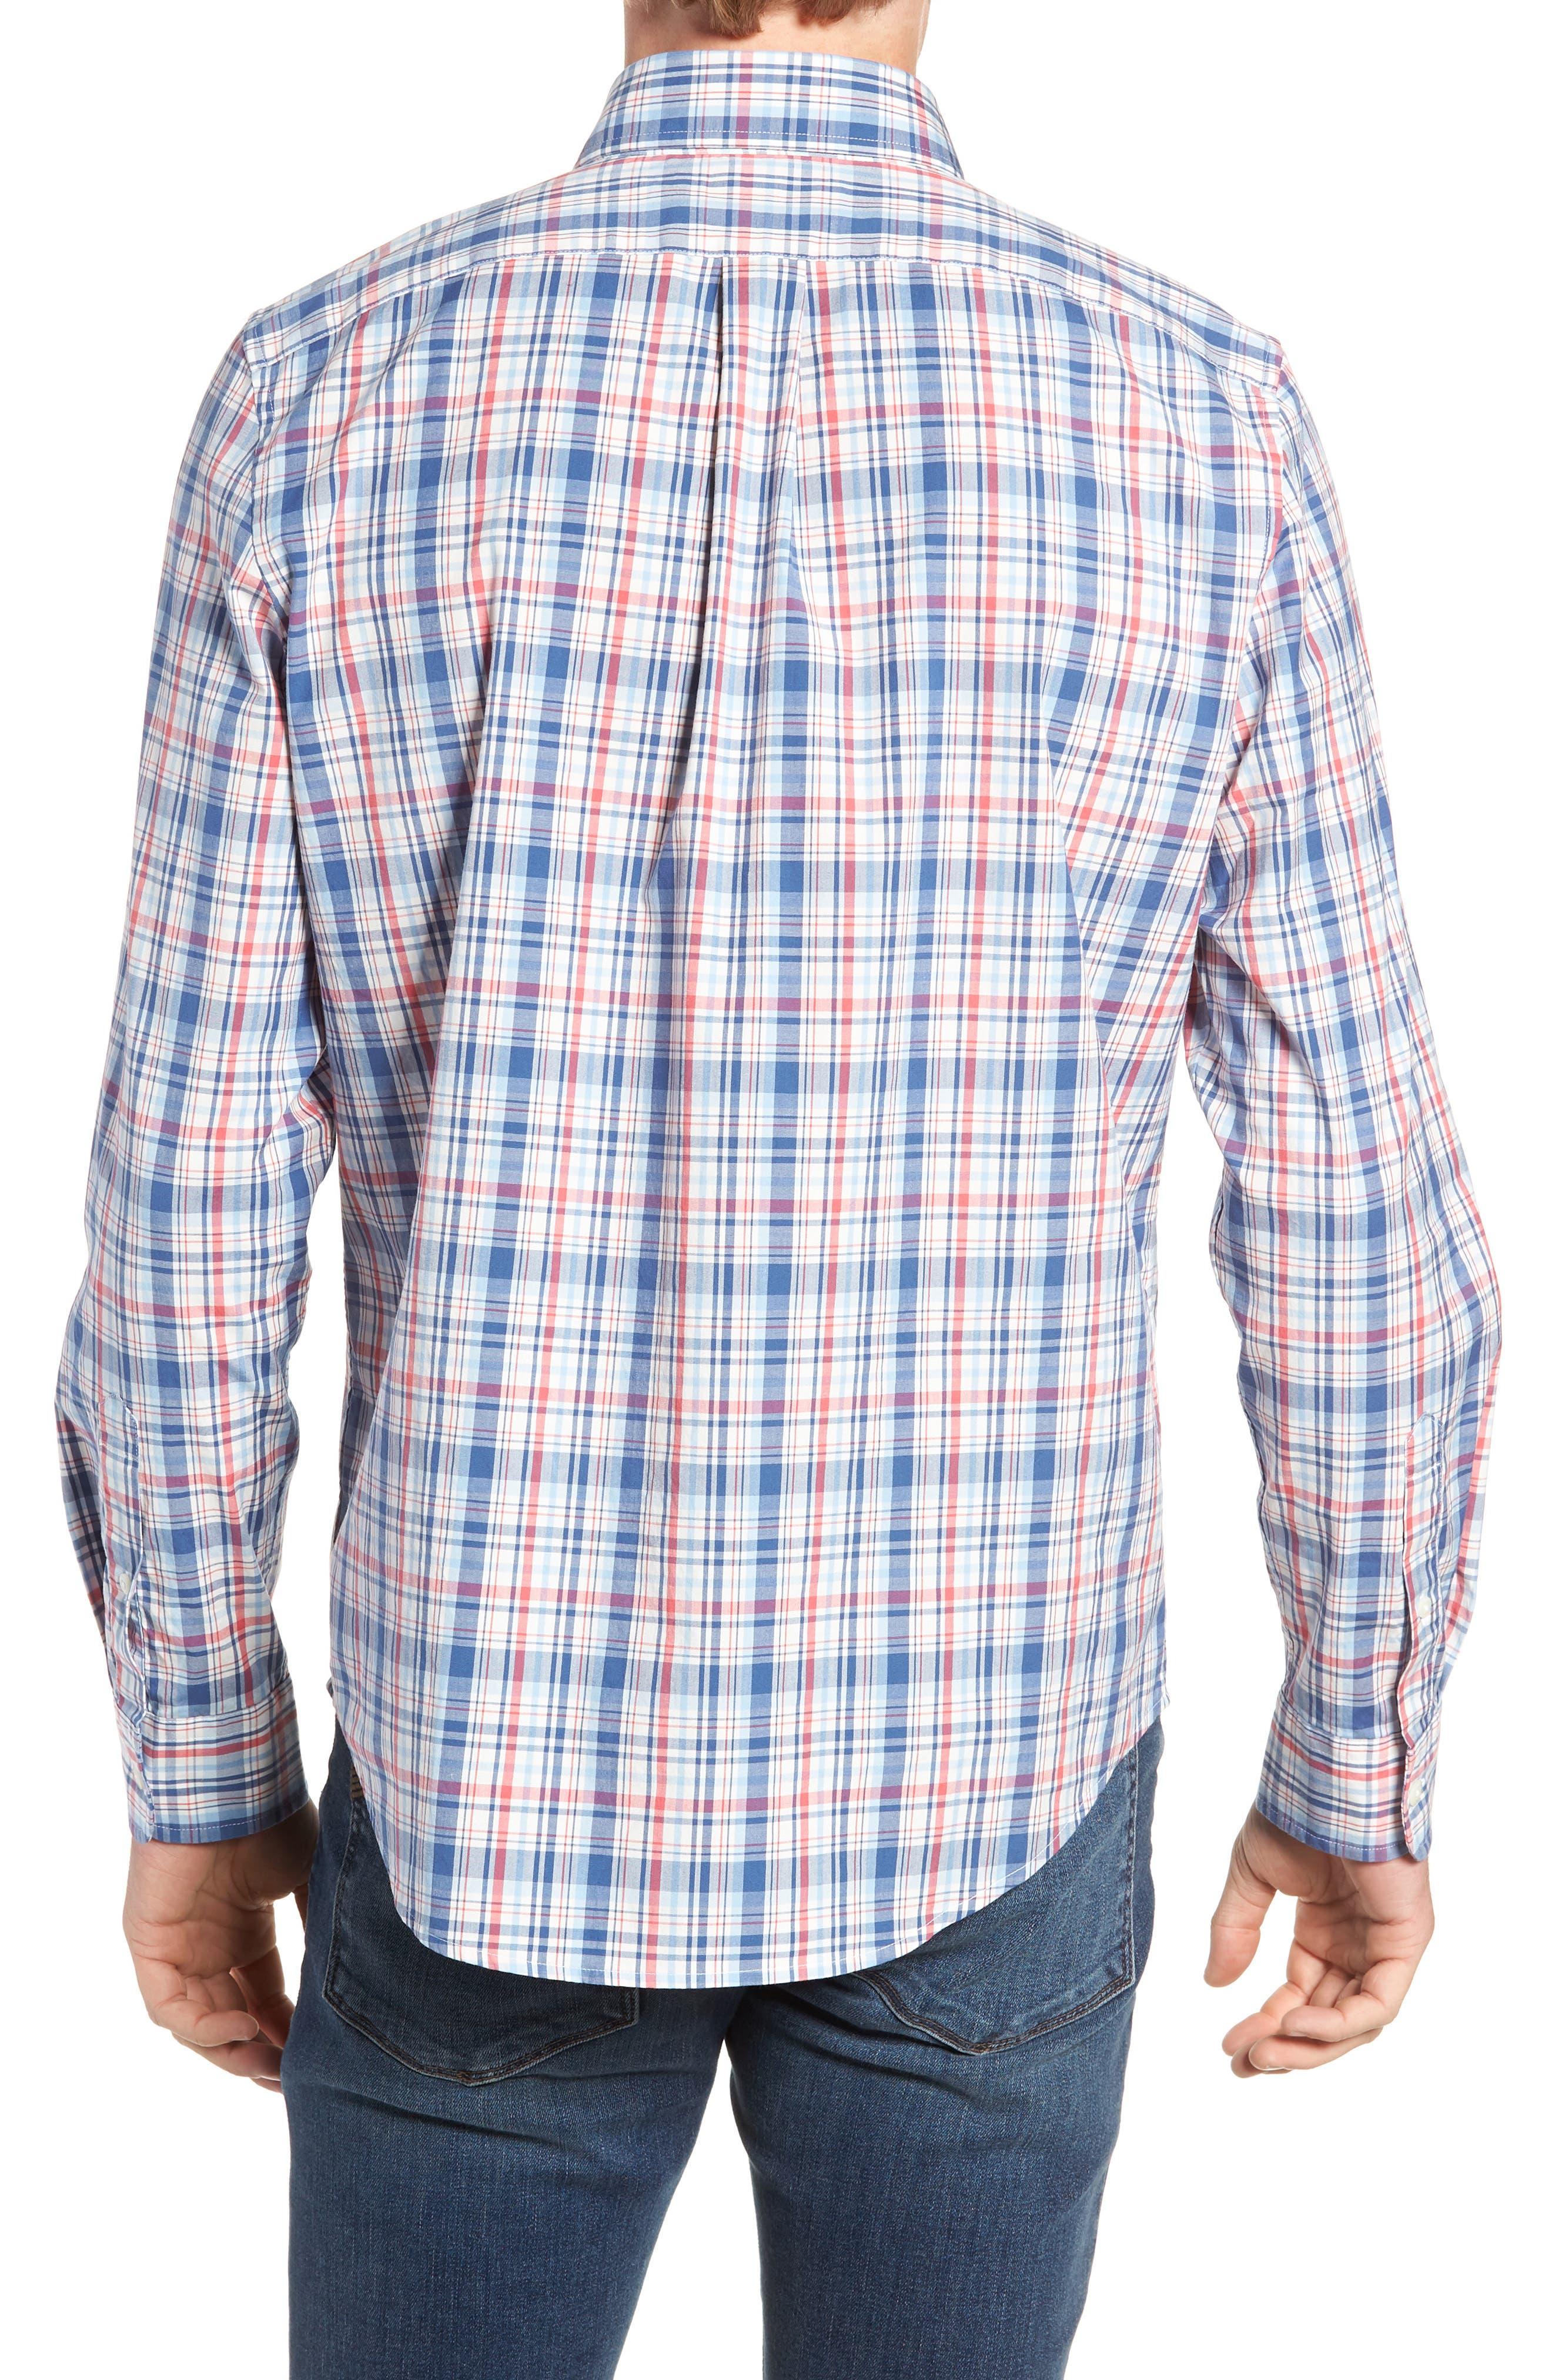 Duke's County Slim Fit Plaid Shirt,                             Alternate thumbnail 3, color,                             MOONSHINE